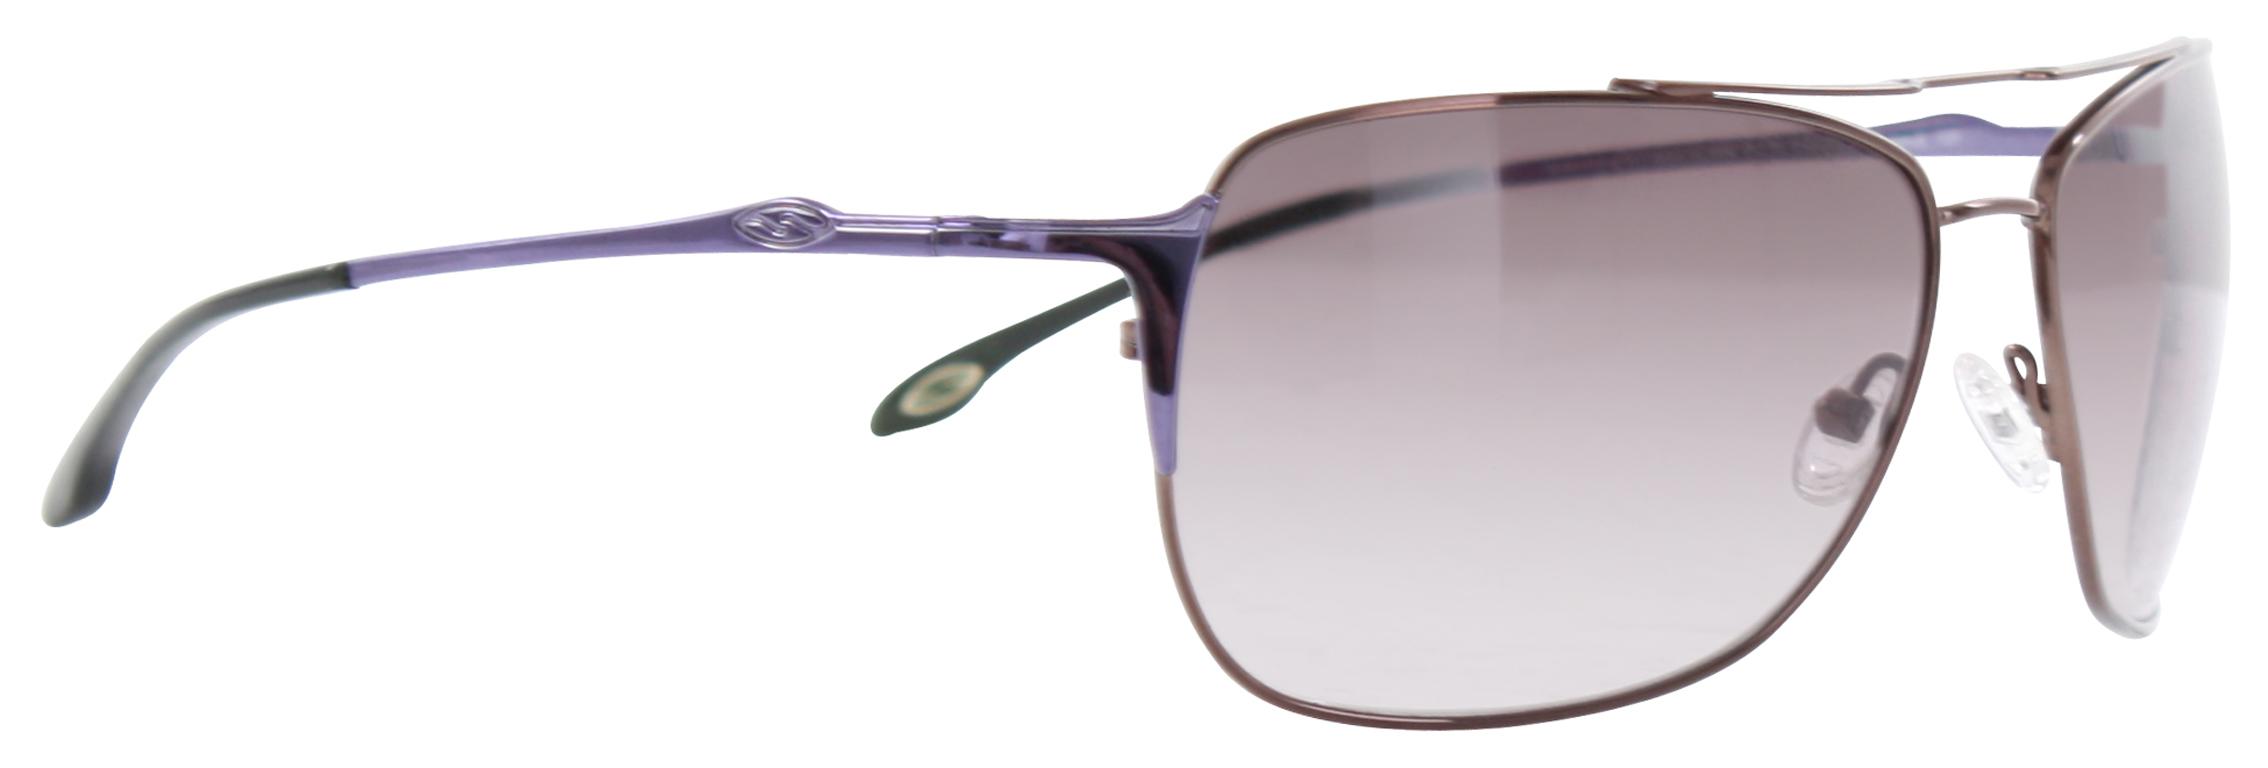 72b41622cb Smith SMITH ROSEWOOD Sunglasses gunmetal purple grey polarized